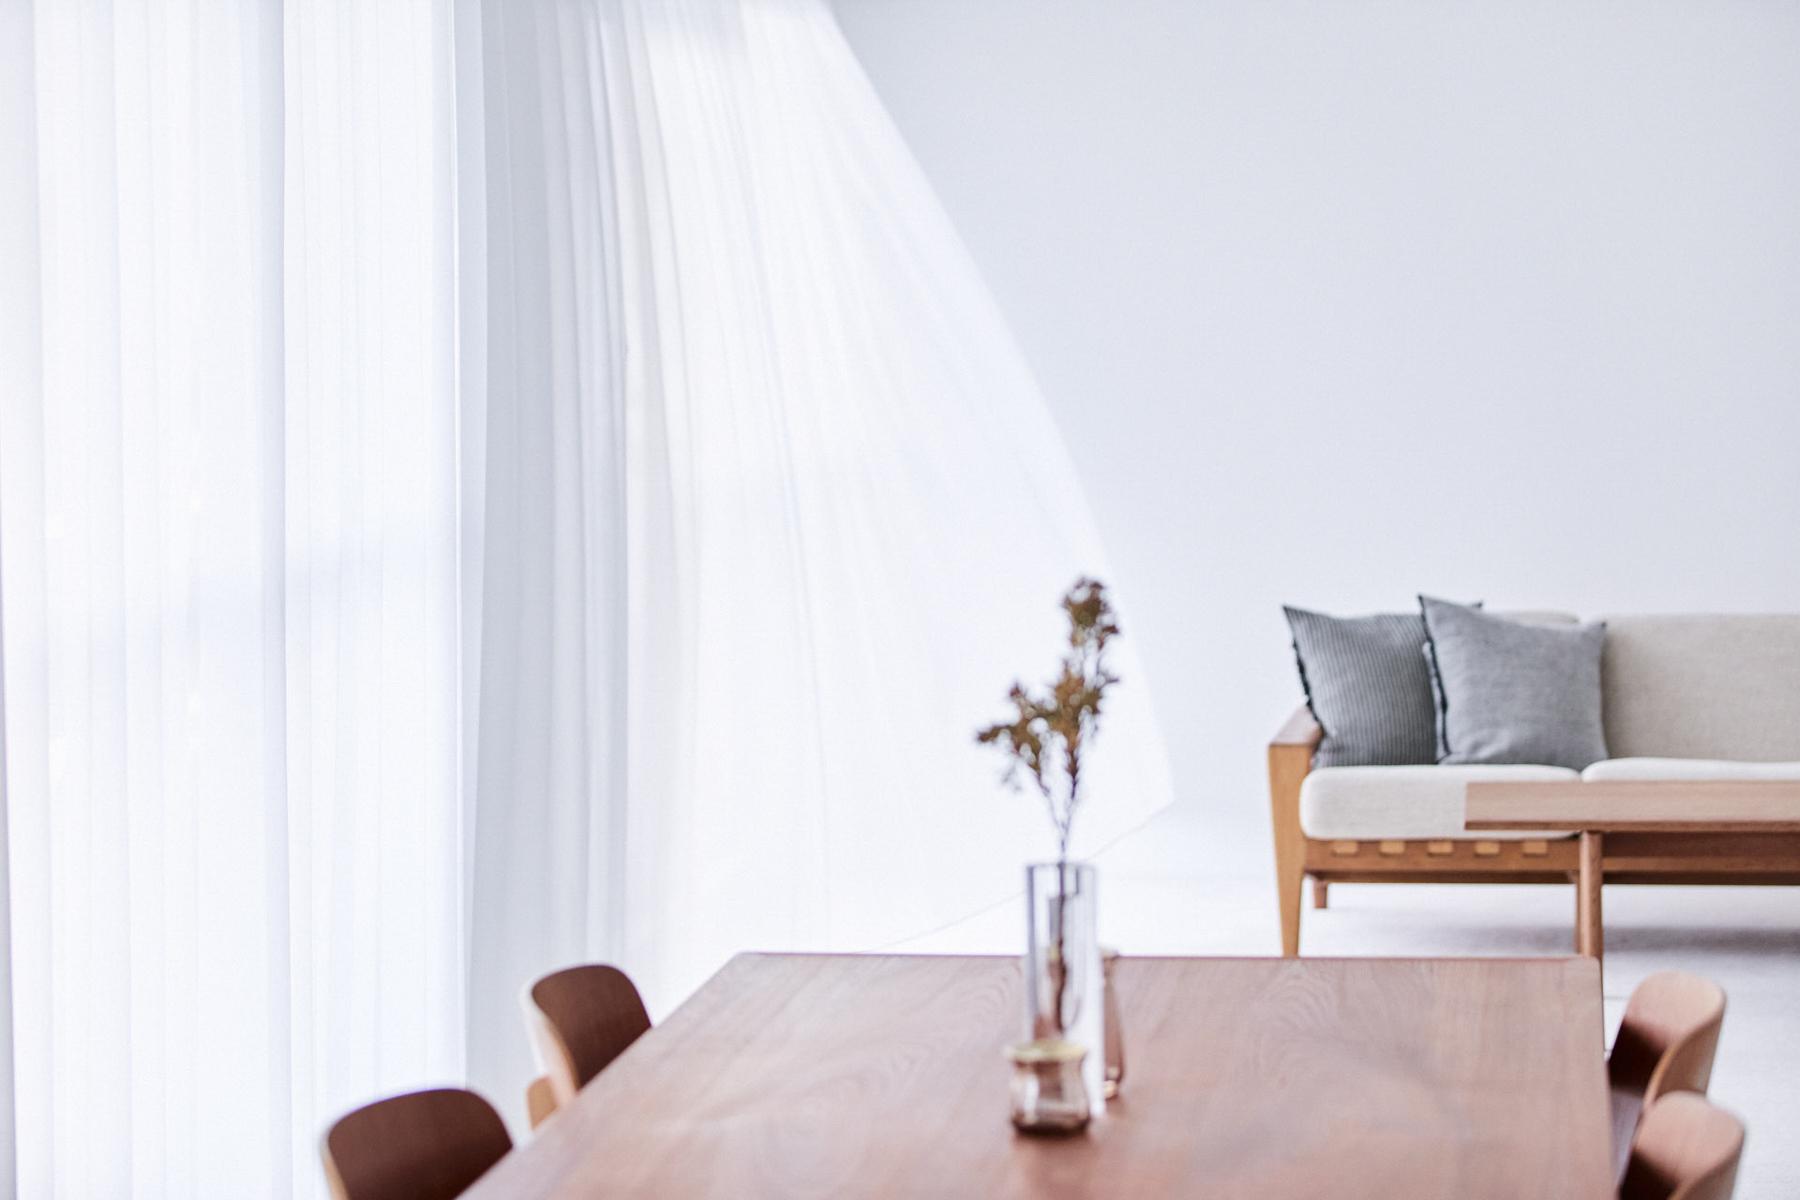 yanke (ヤンケ)501 マットなモルタル左官壁